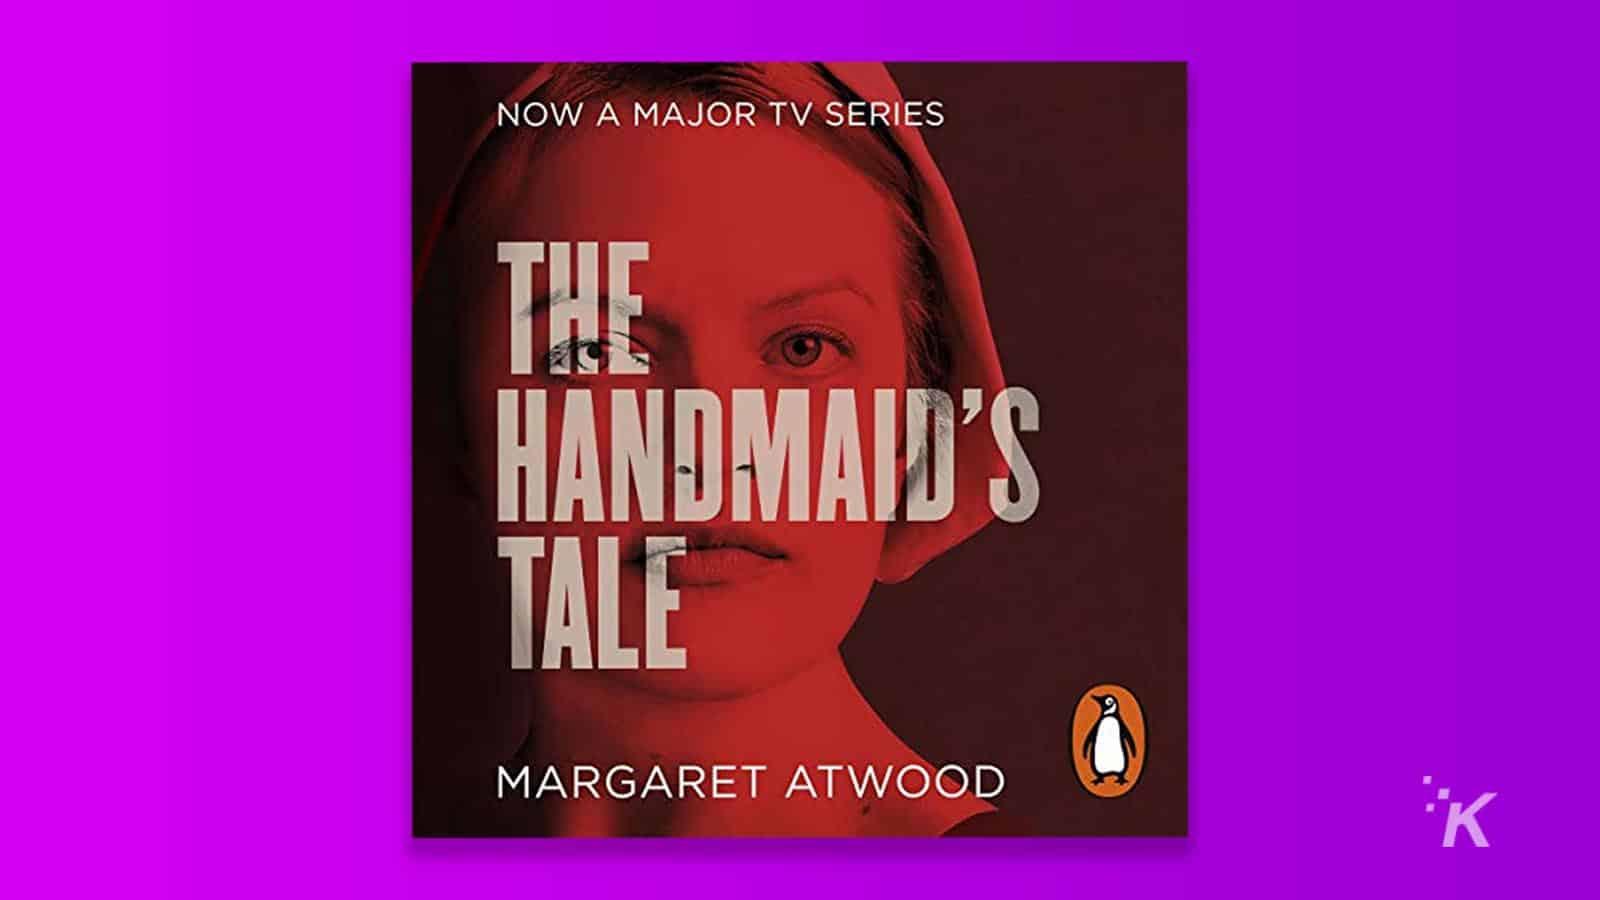 the handmaid's tale on audible